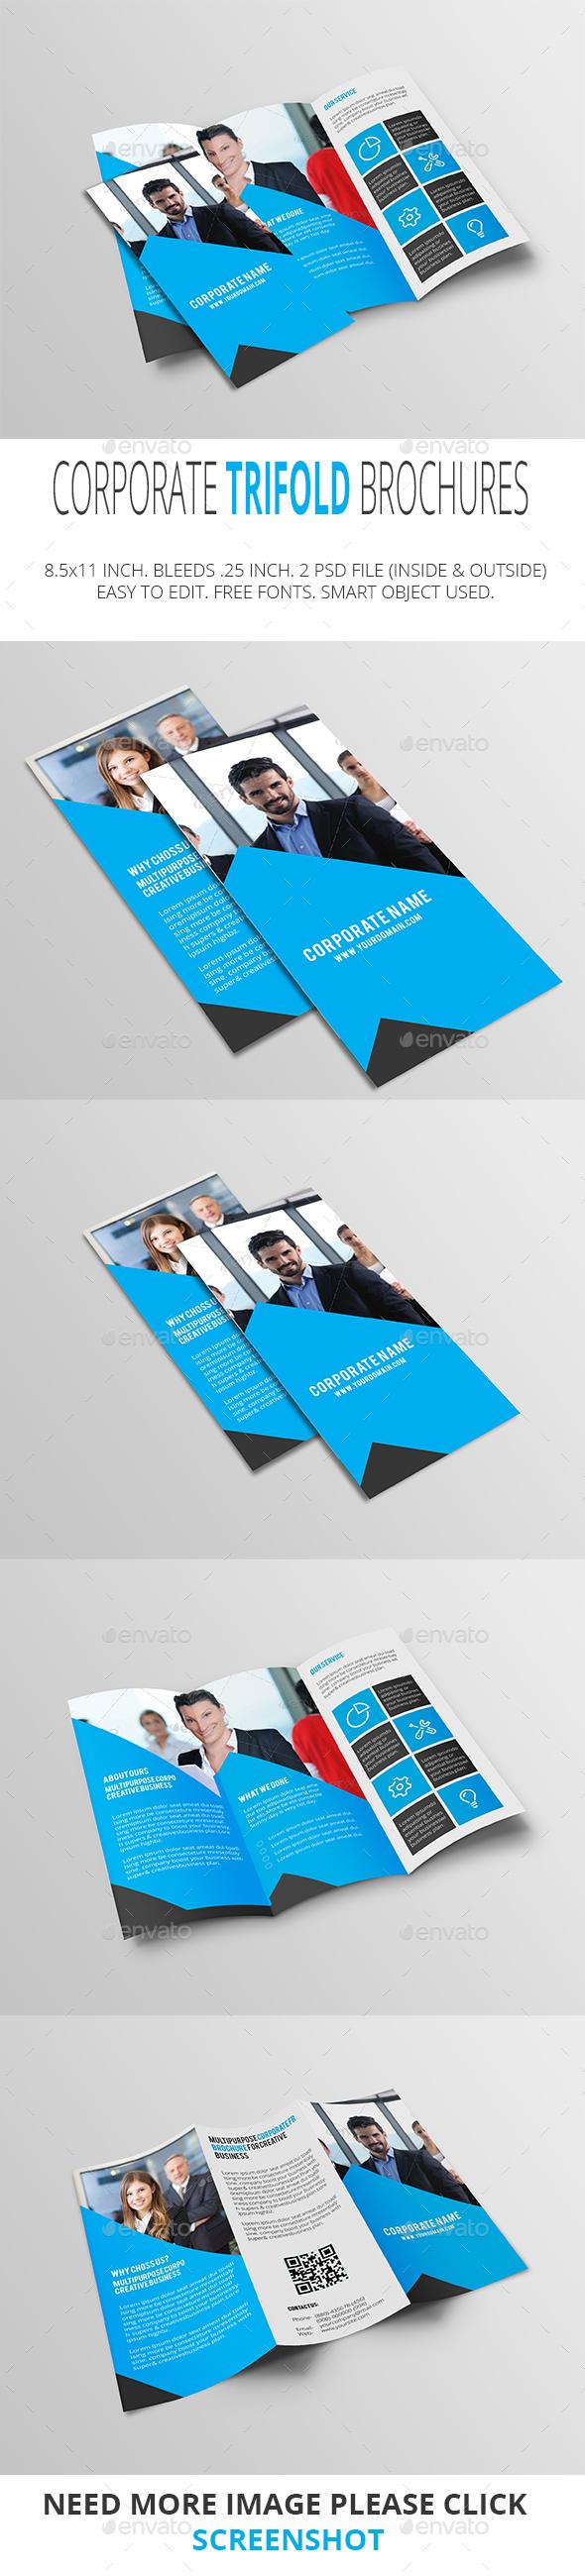 Corporate Tri-Fold Brochure V02